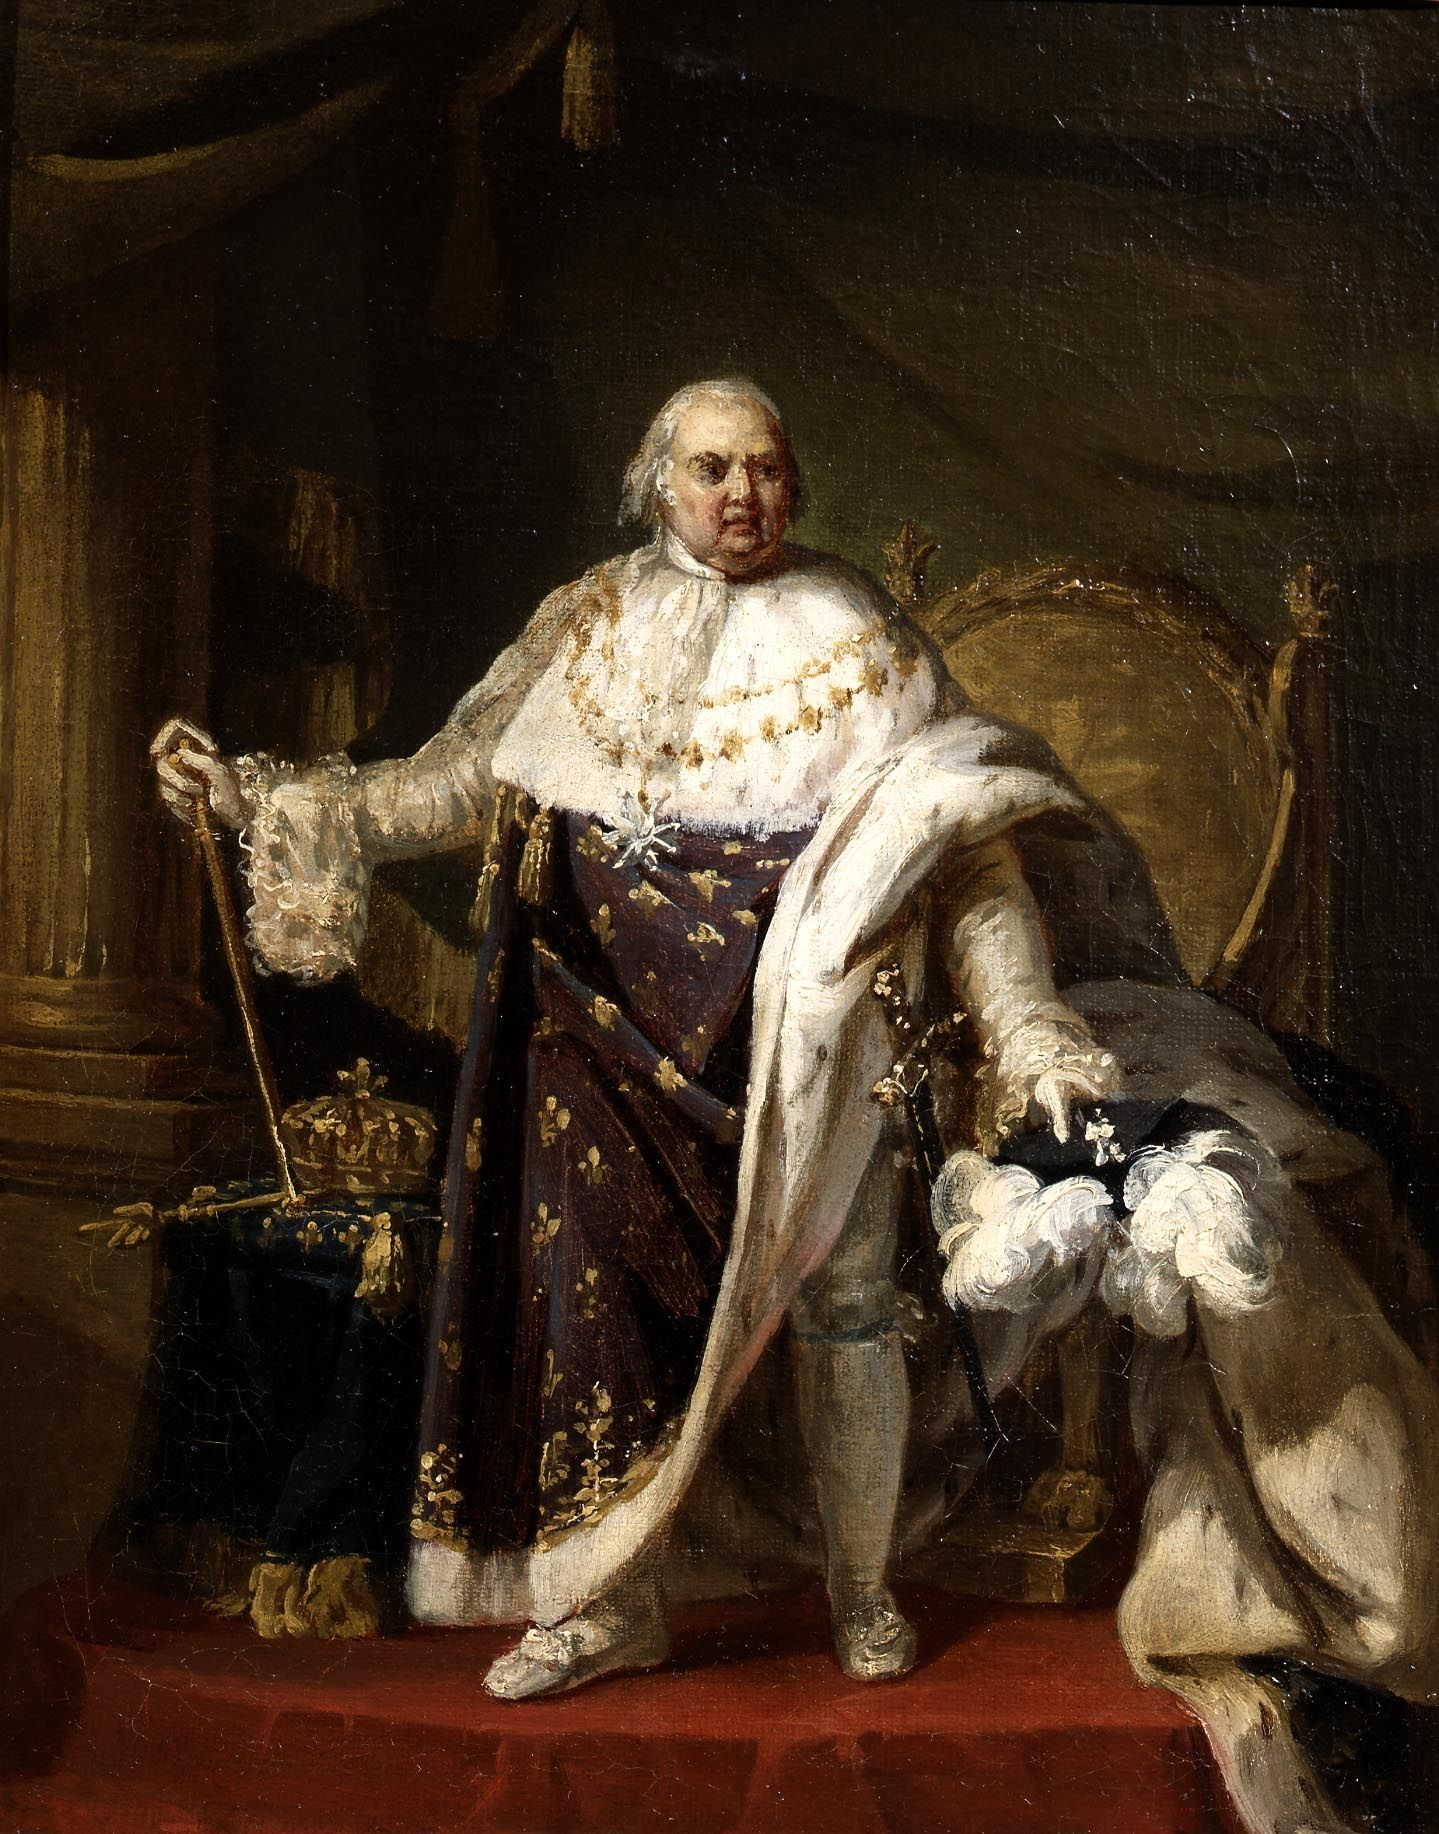 Anthony Francois Callet - - - Louis XVIII (1755 - 1824) 1814c. | Koning